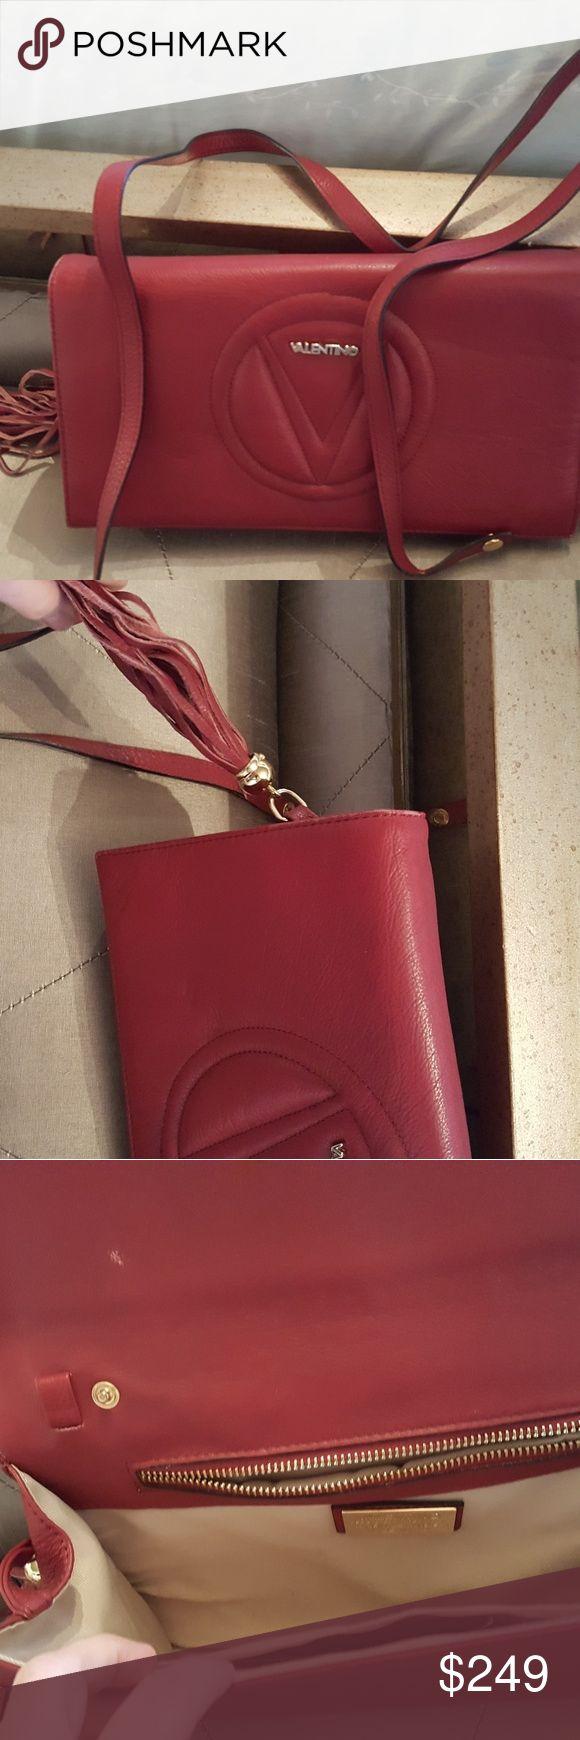 Authentic valentino crossbody  bag Authentic valentino crossbody bag in red Valentino Bags Crossbody Bags